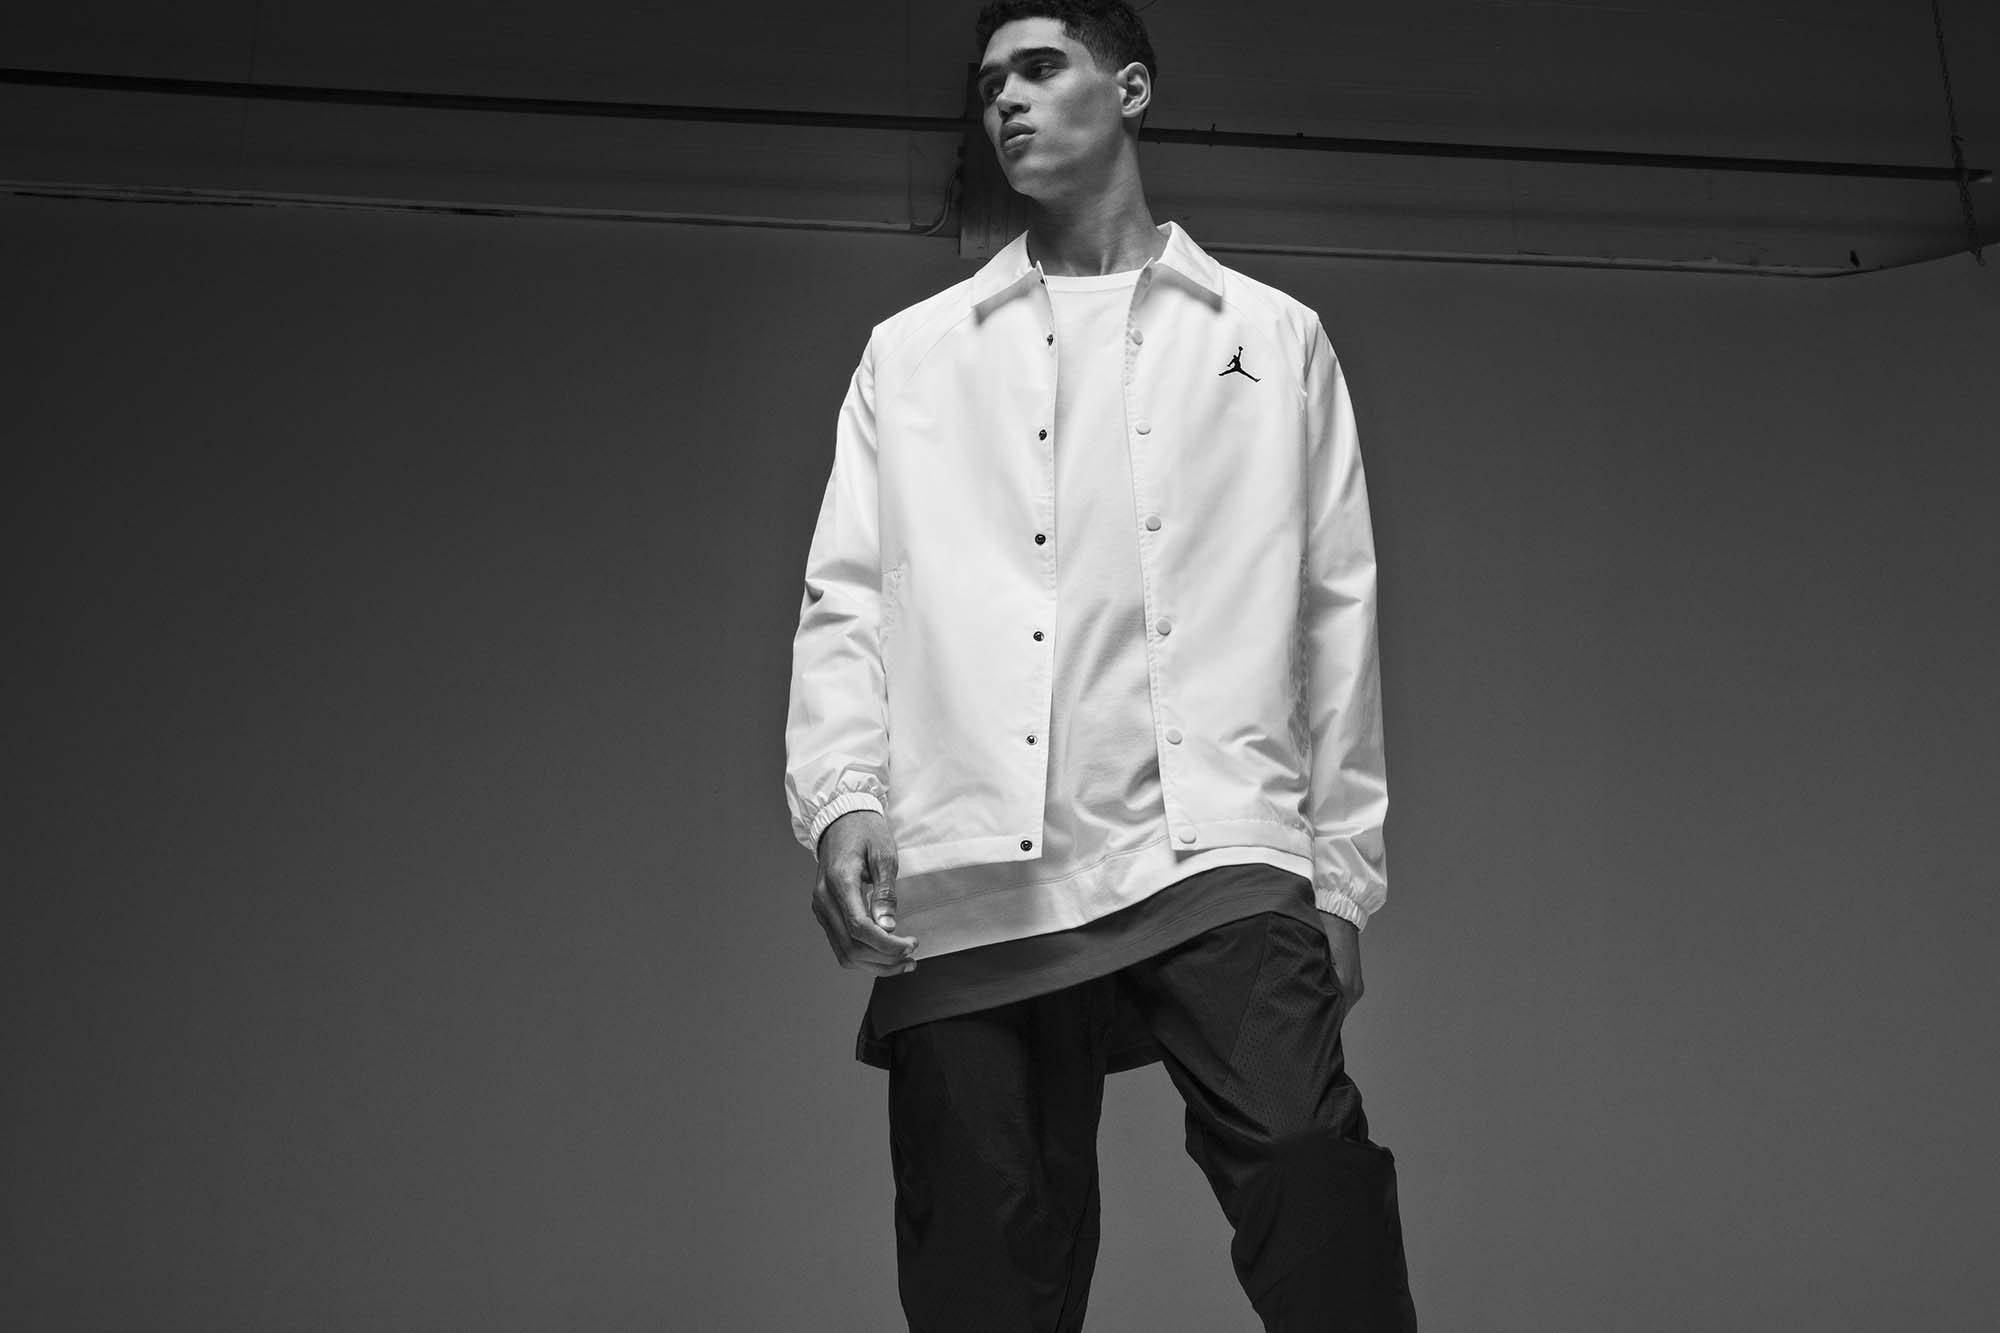 jordan-brand-2017-aw-clothing-collection-004